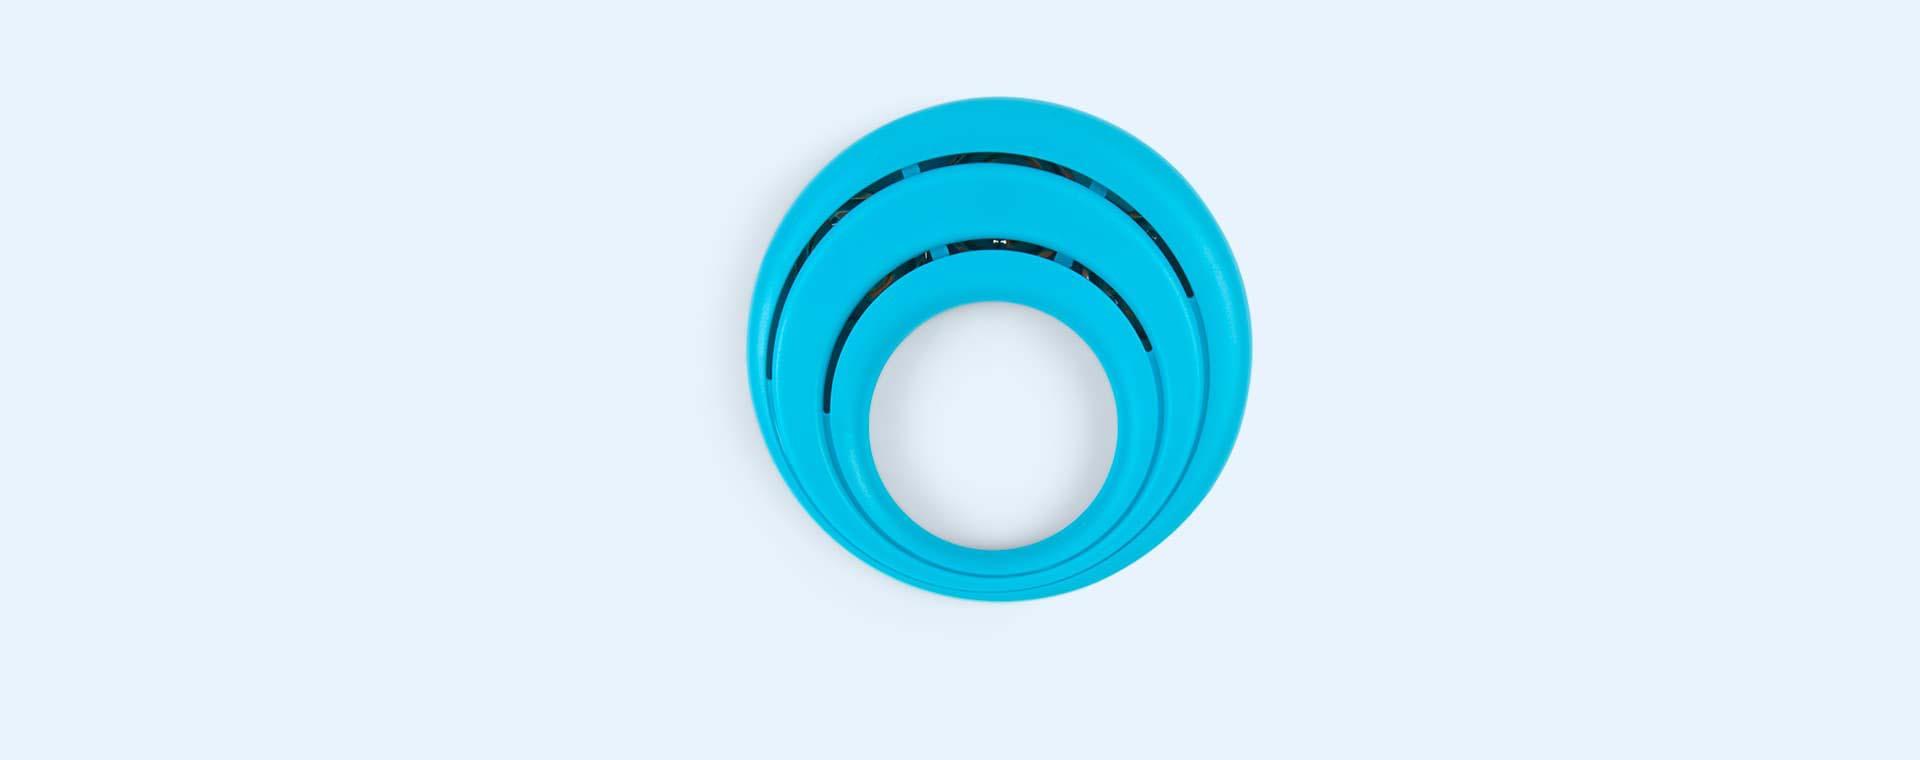 Blue Halilit Tropical Tambourine